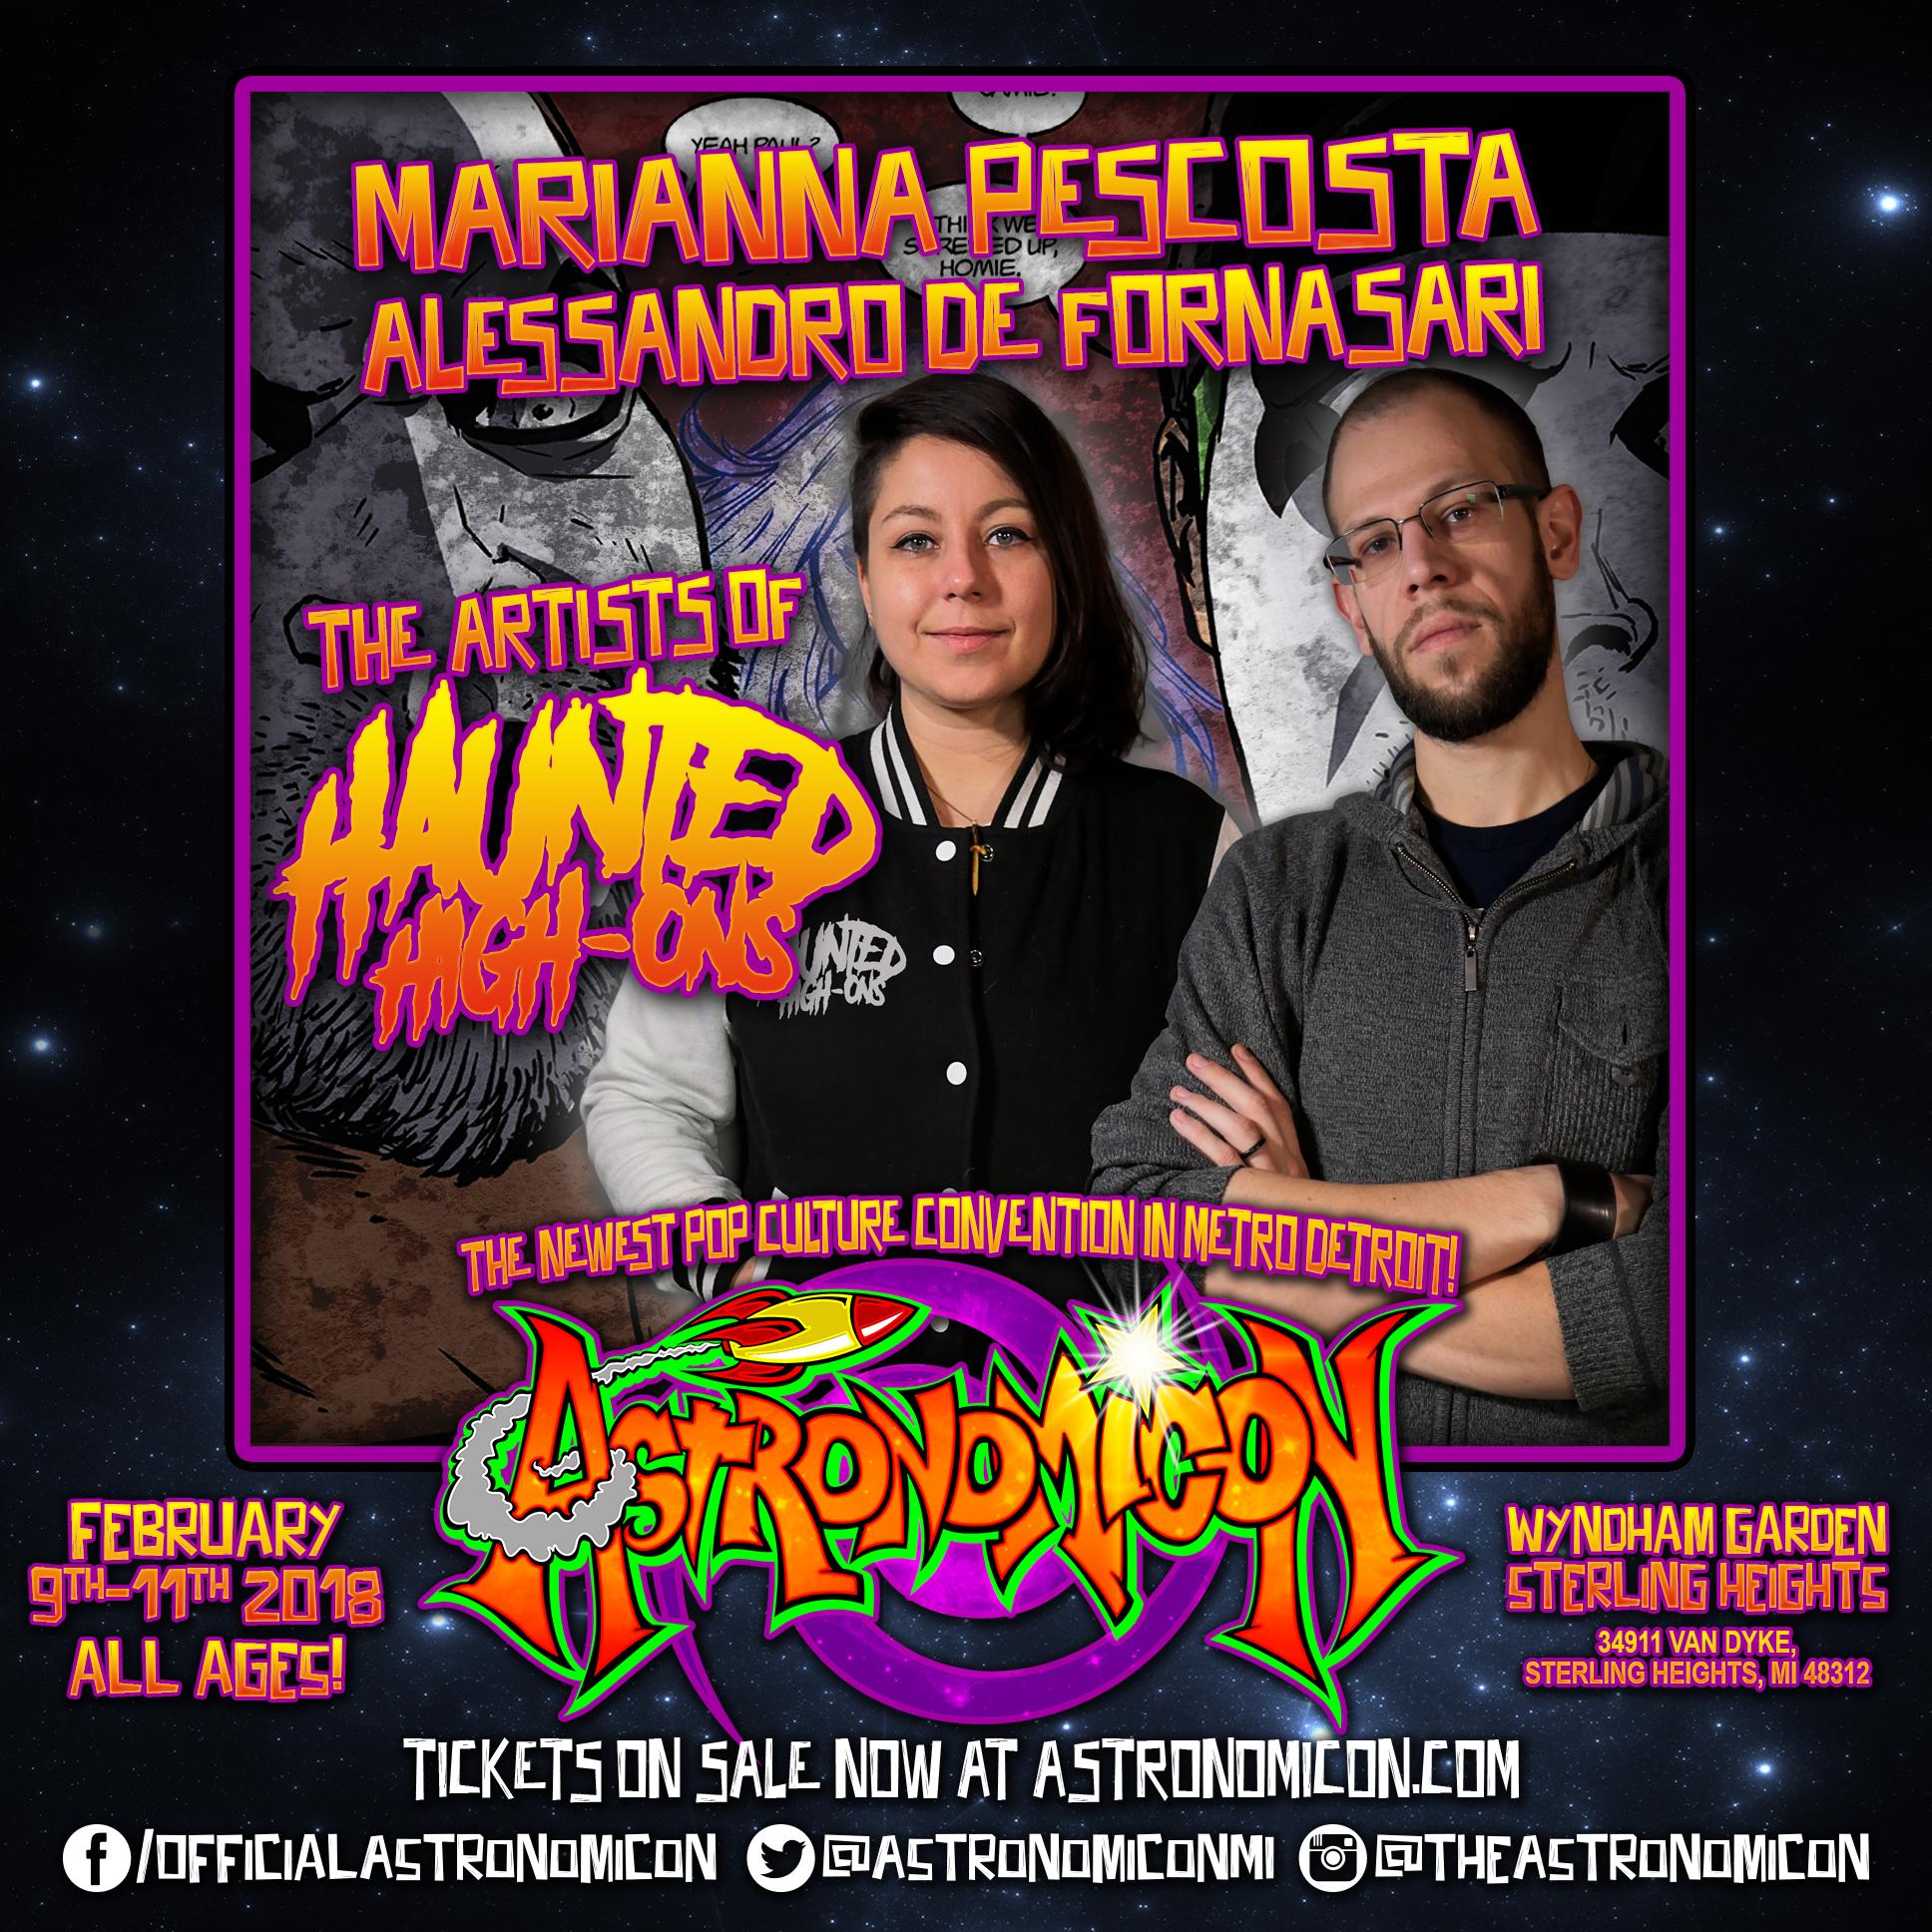 Marianna Pescosa &Alessandro de Fornasari   https://www.facebook.com/marianna.pescosta  https://www.facebook.com/inikobeats/